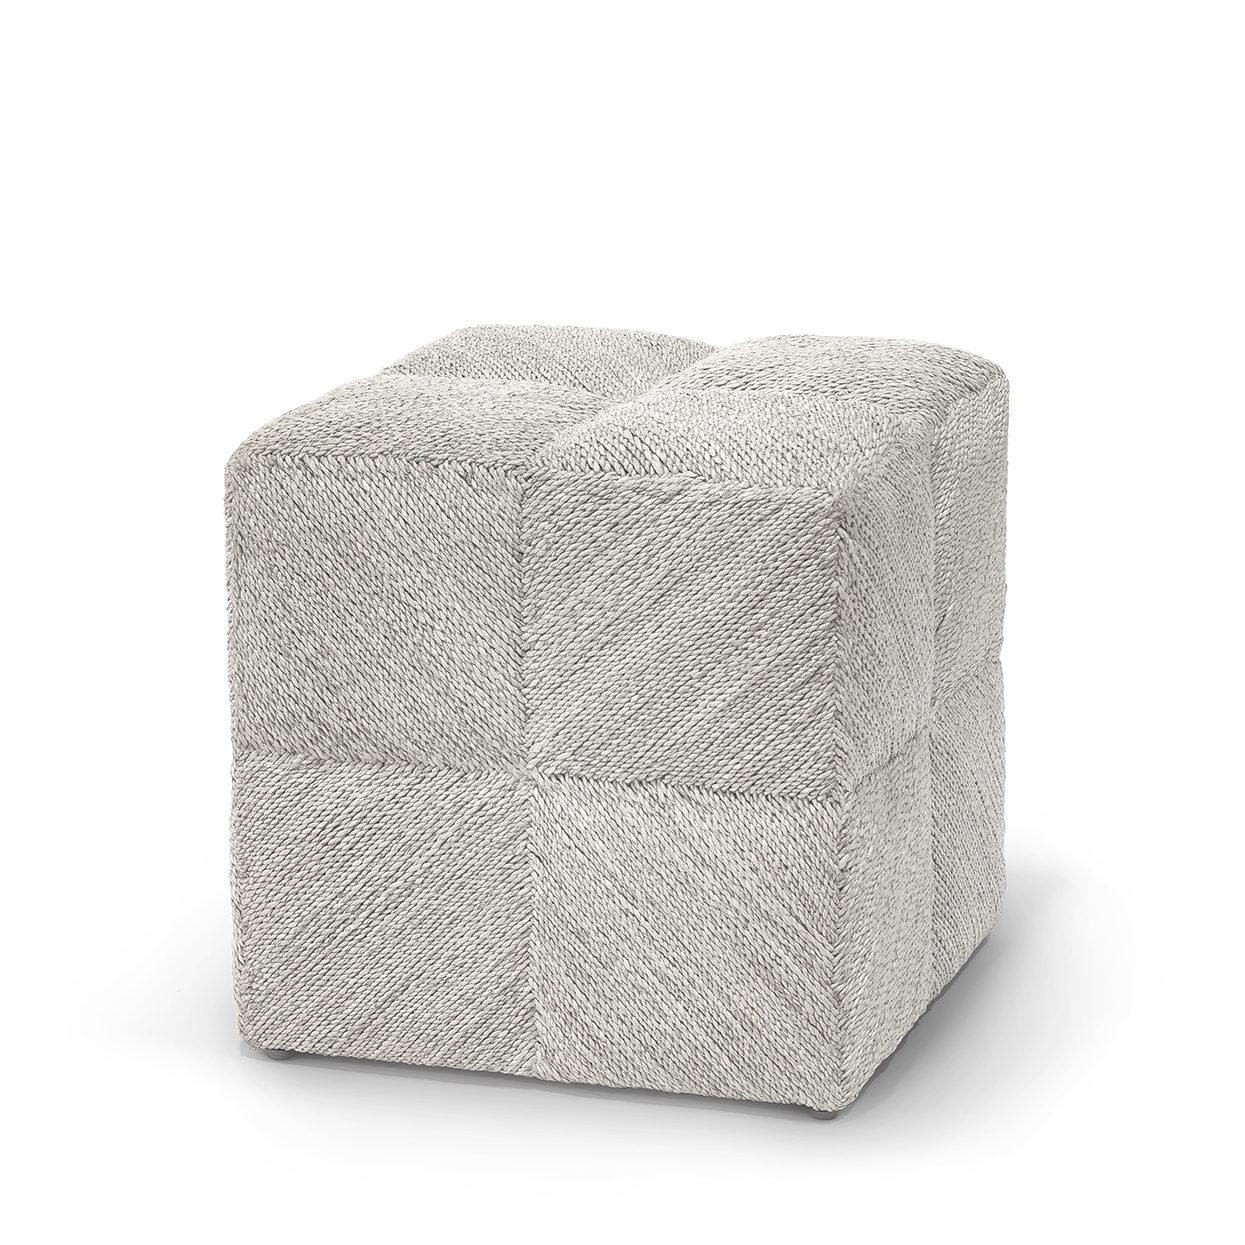 Magnificent White Washed Rope Cube Ottoman Mecox Gardens Creativecarmelina Interior Chair Design Creativecarmelinacom